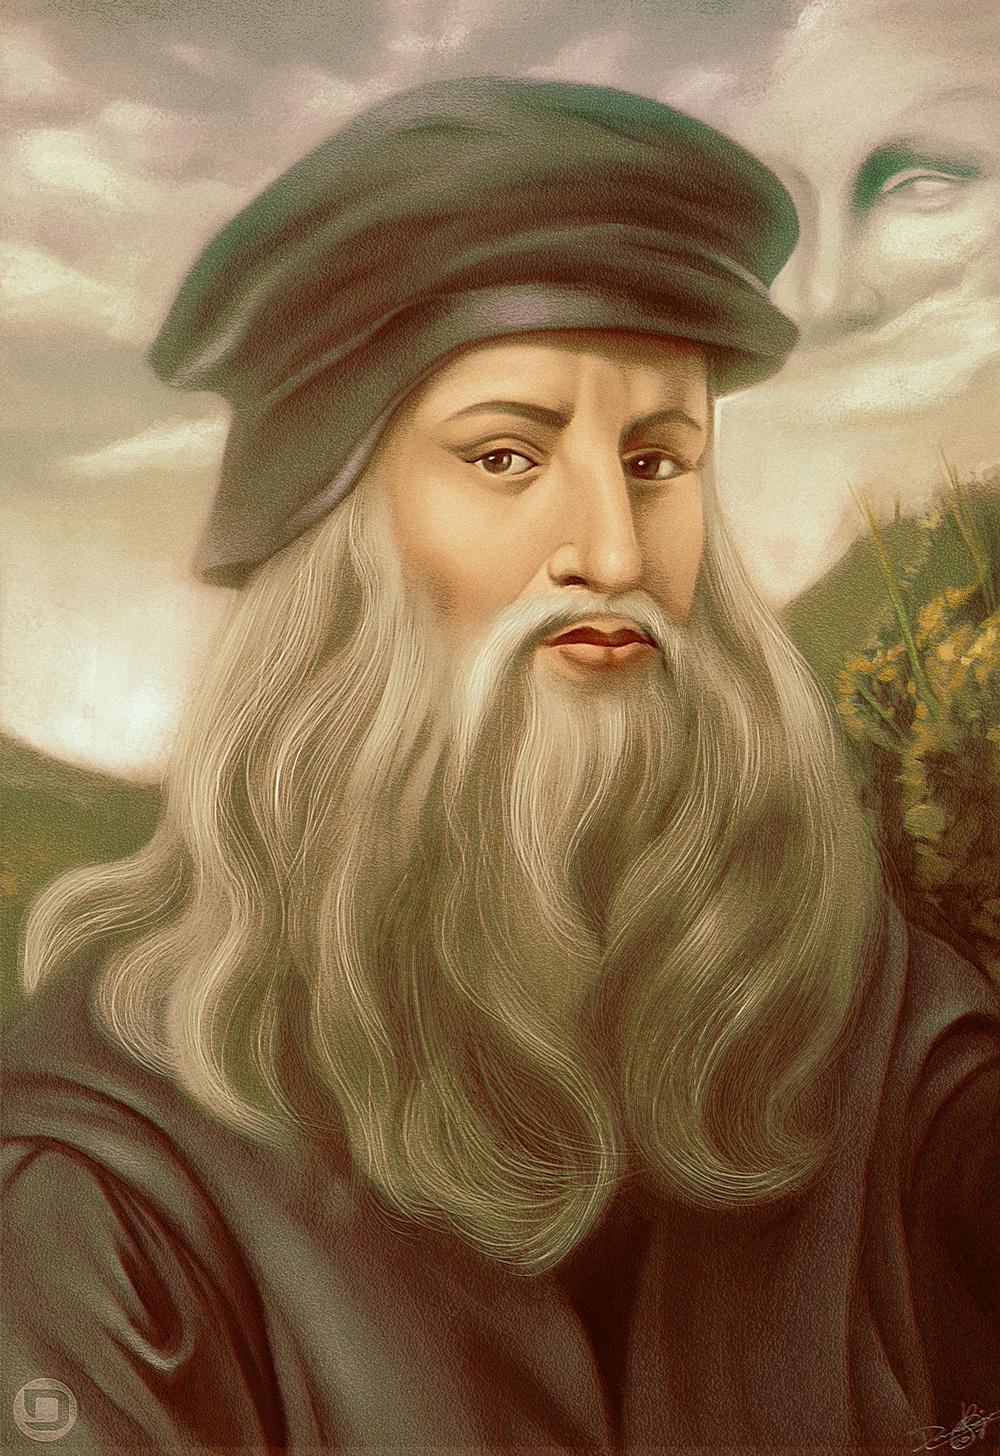 Leonardo Da Vinci Portrait Painting By Dannykojimaart